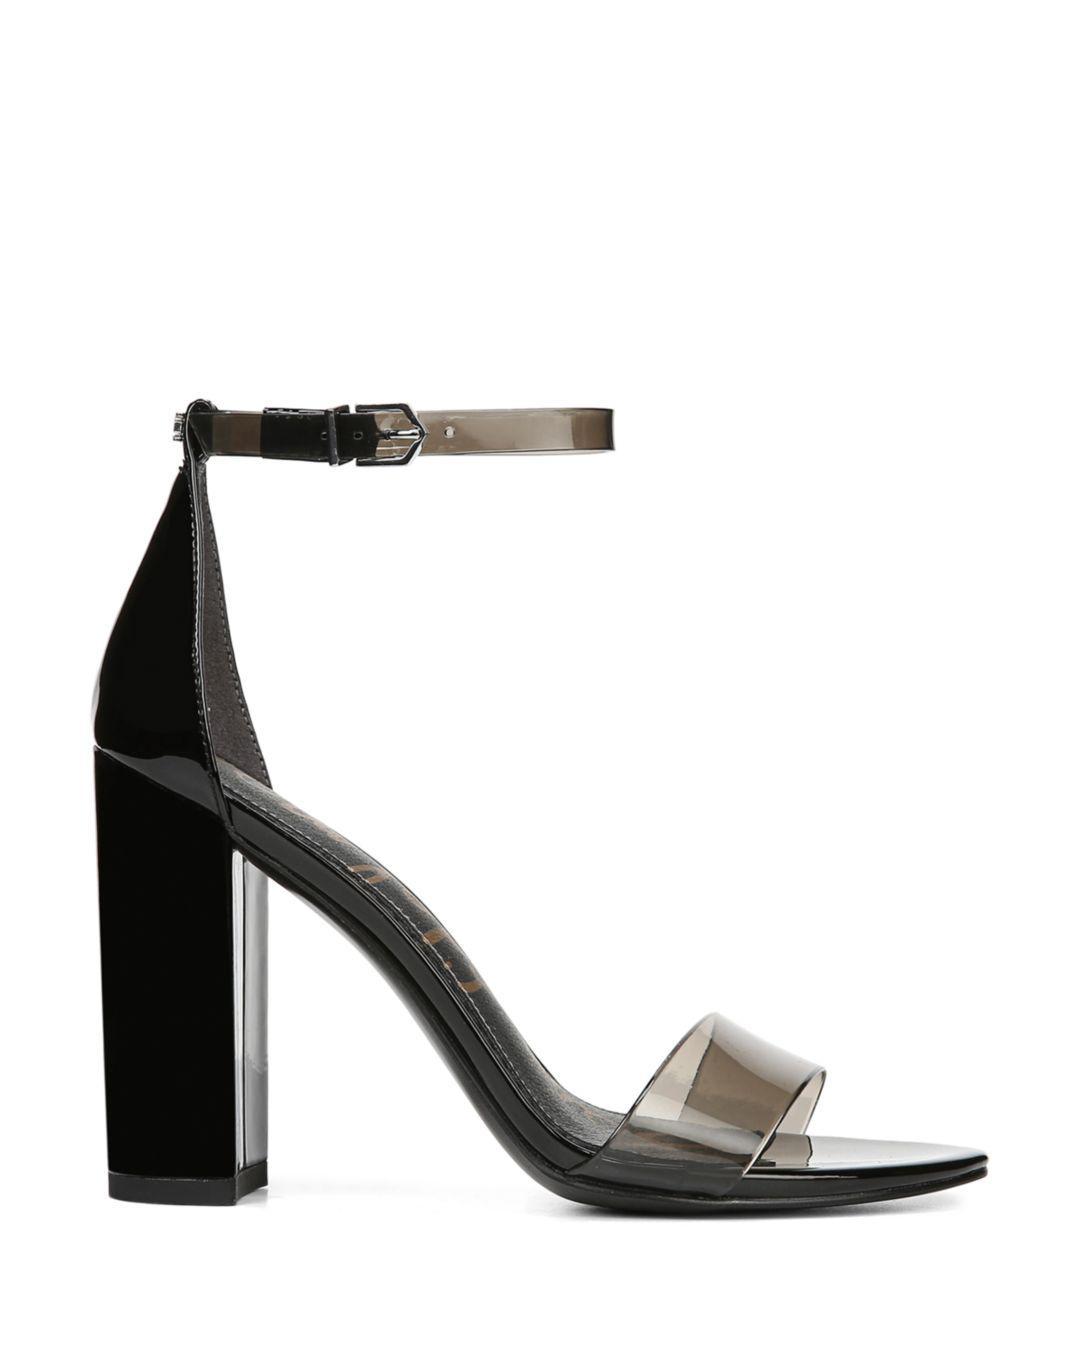 c63f3c25d85 Lyst - Sam Edelman Women s Yaro Sheer Ankle Strap High-heel Sandals in Black